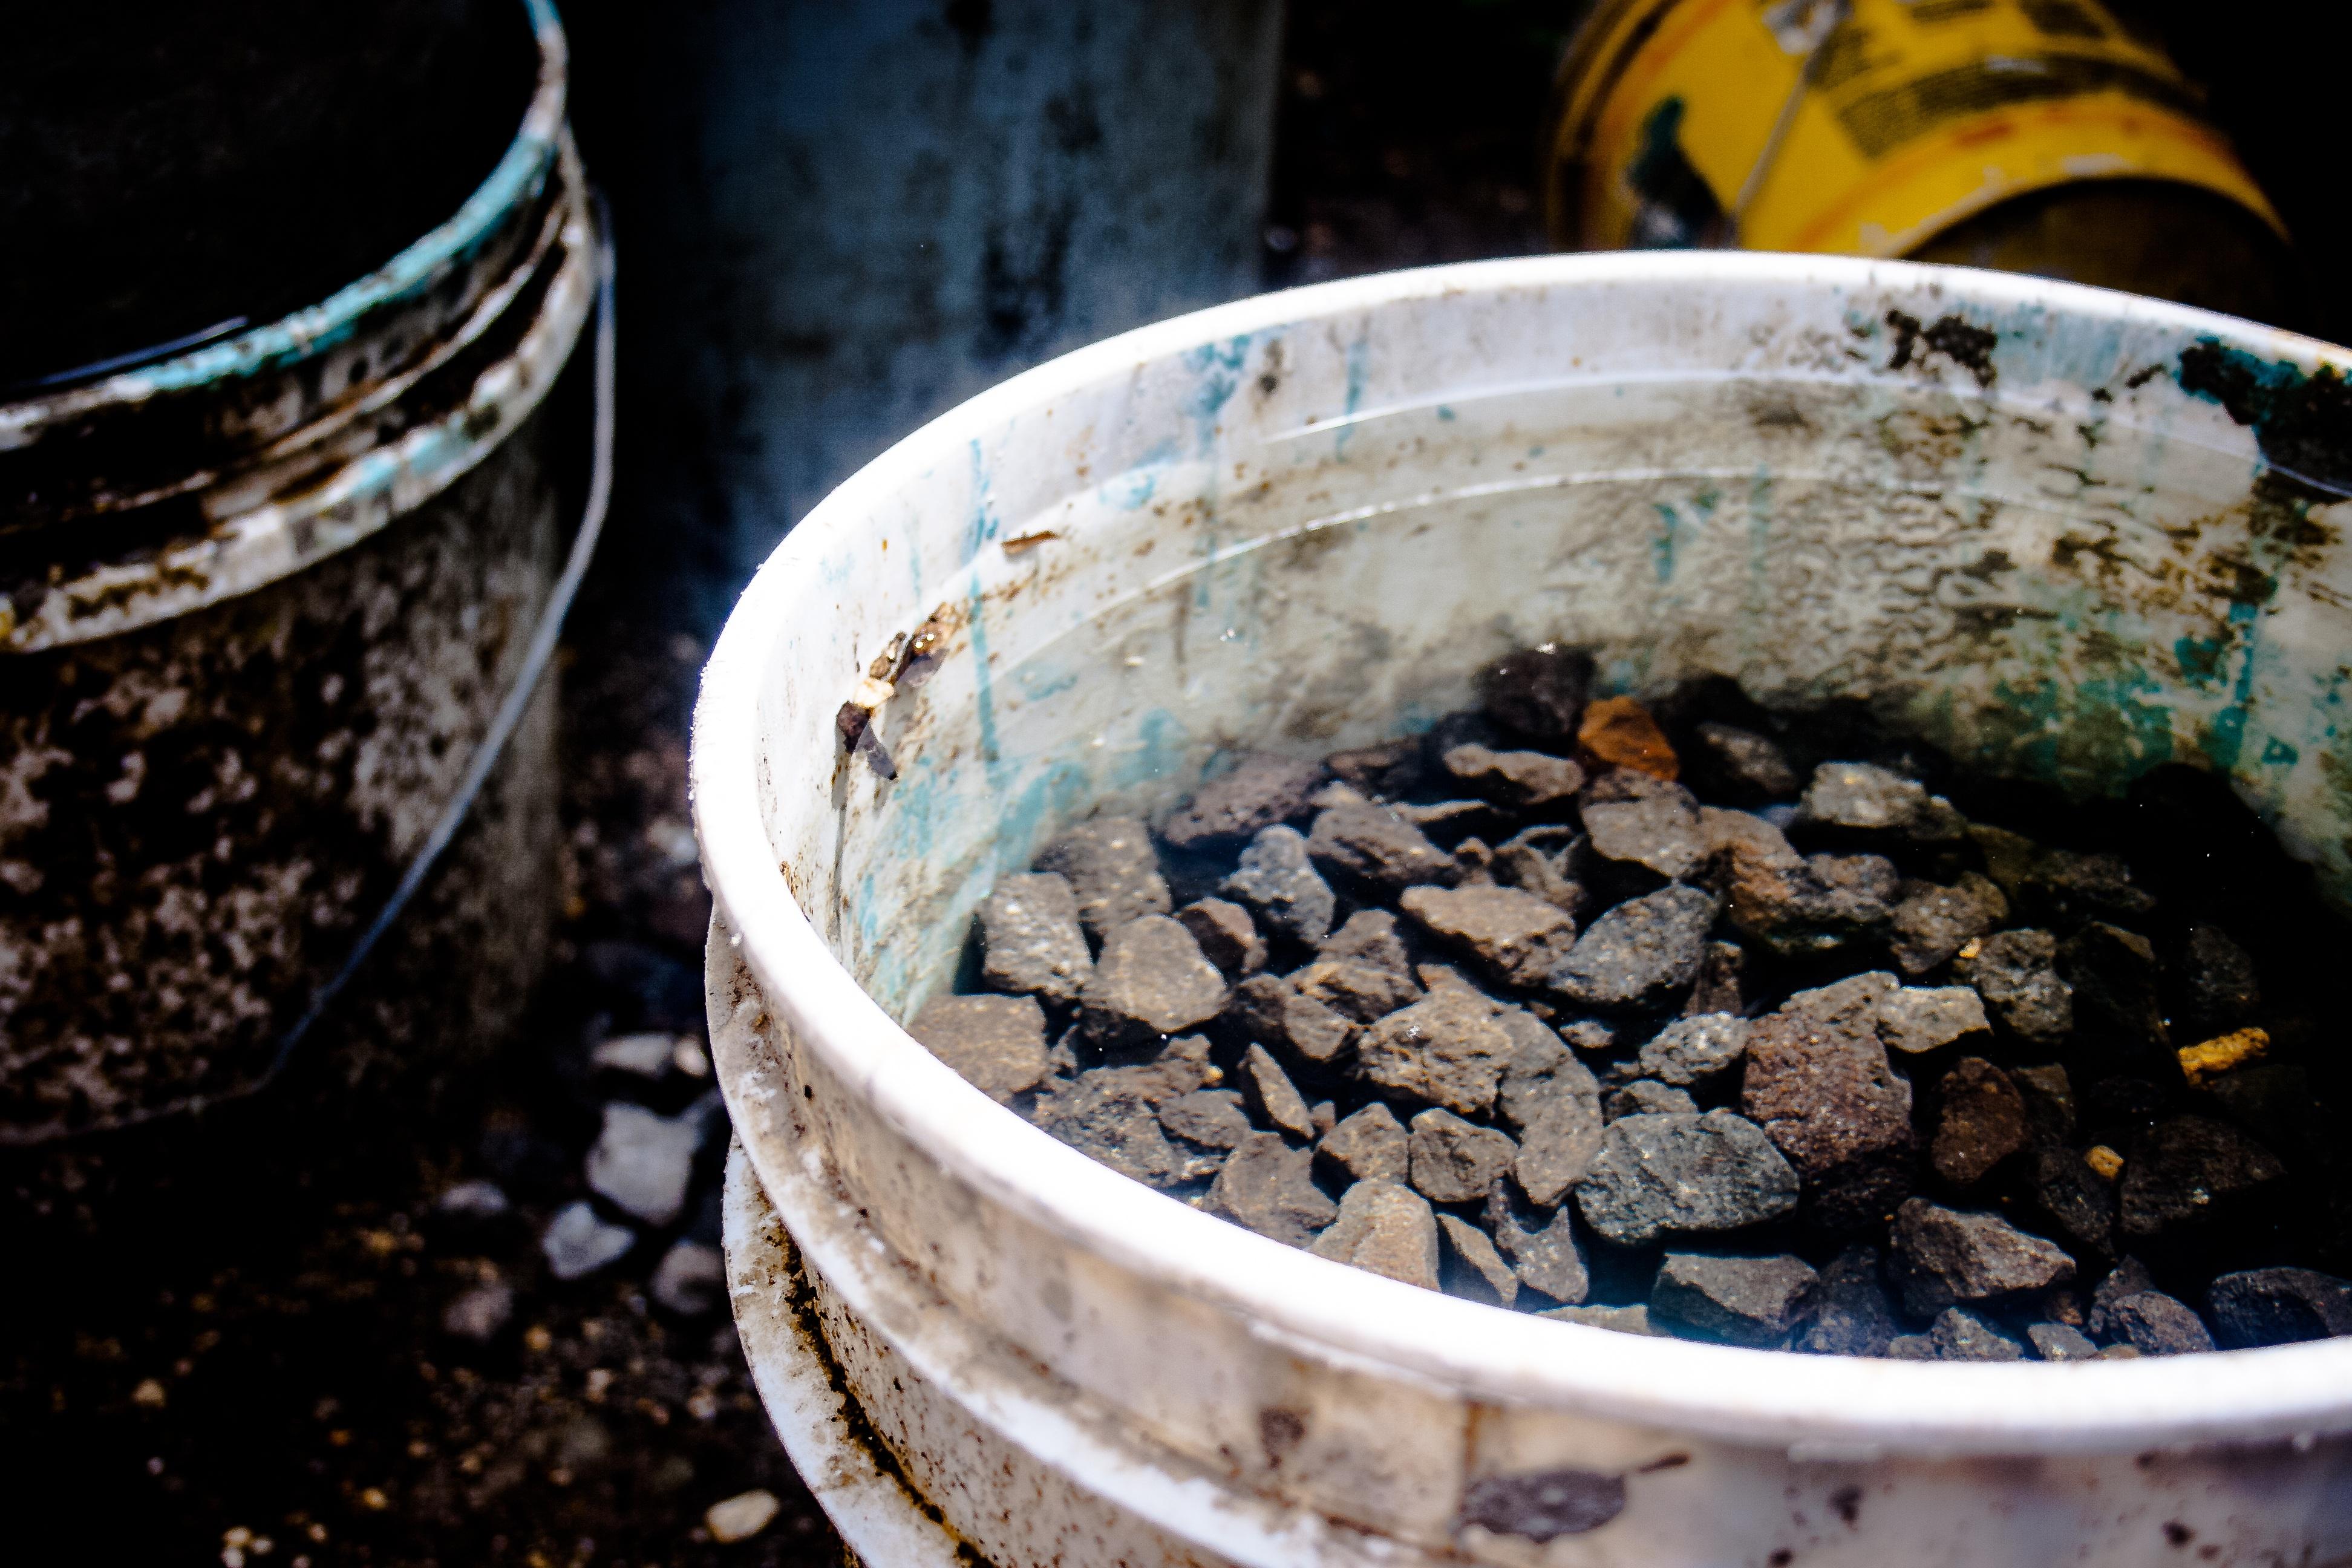 Fotos gratis : agua, construcción, comida, color, suelo, azul ...